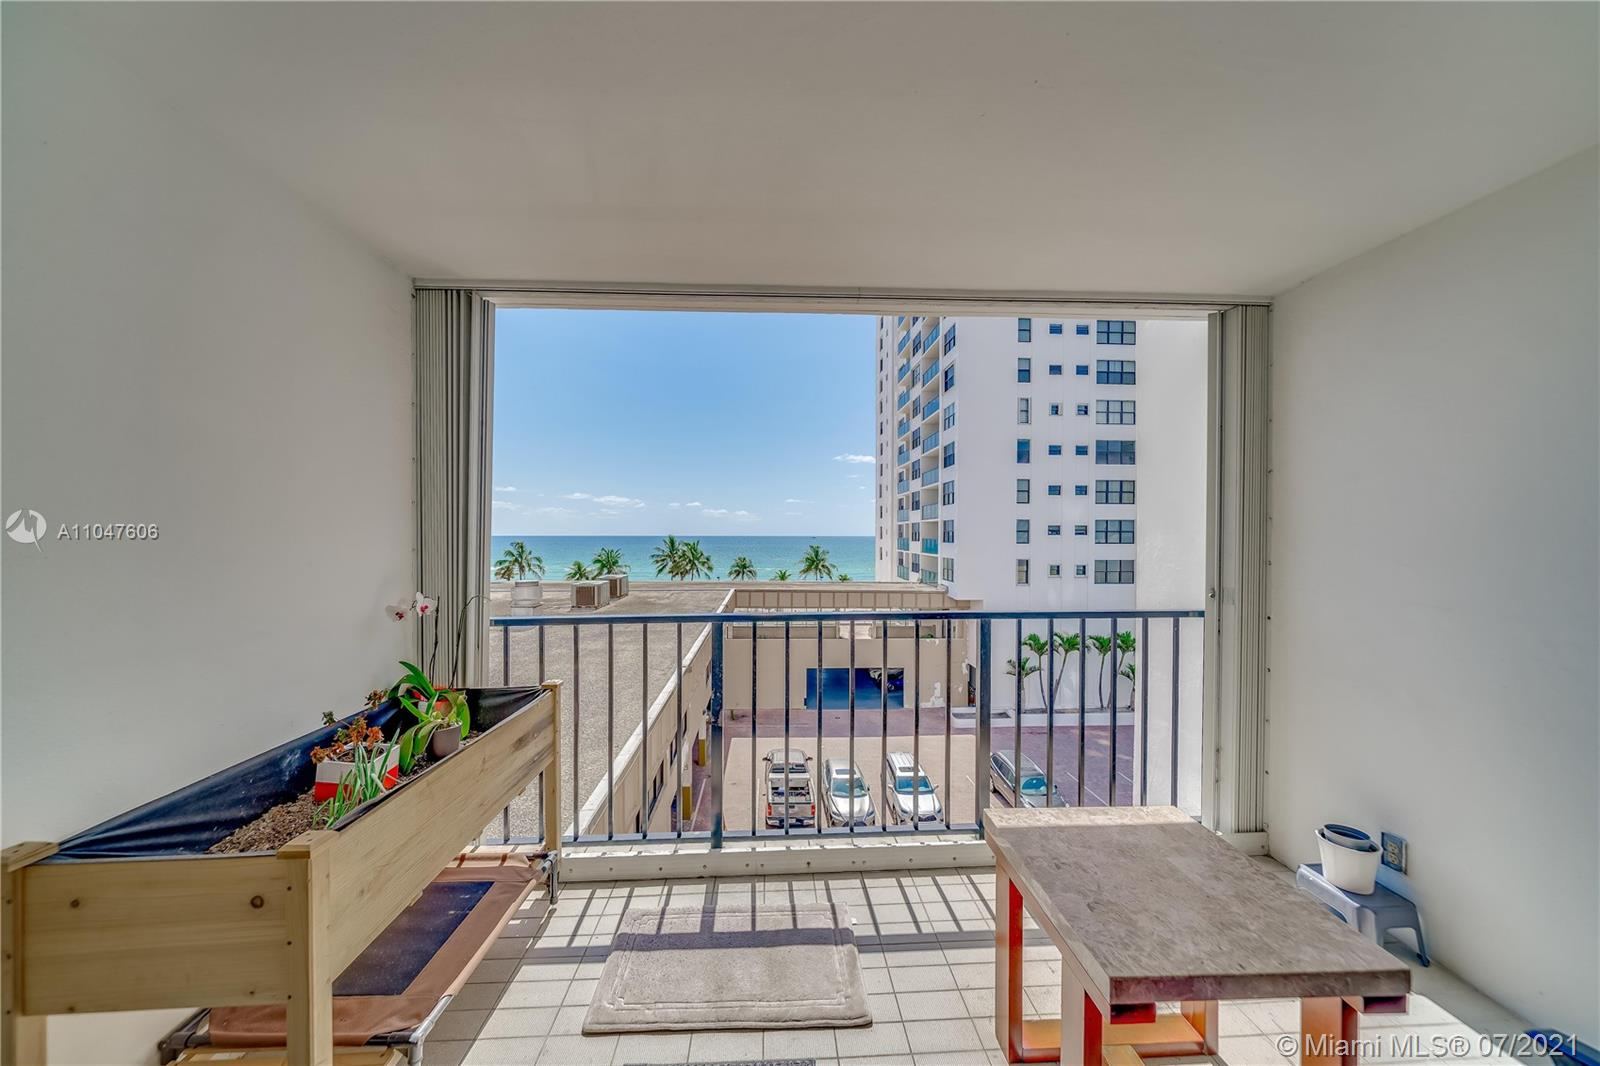 Catania, Tower 2 #503 - 2401 S Ocean Dr #503, Hollywood, FL 33019